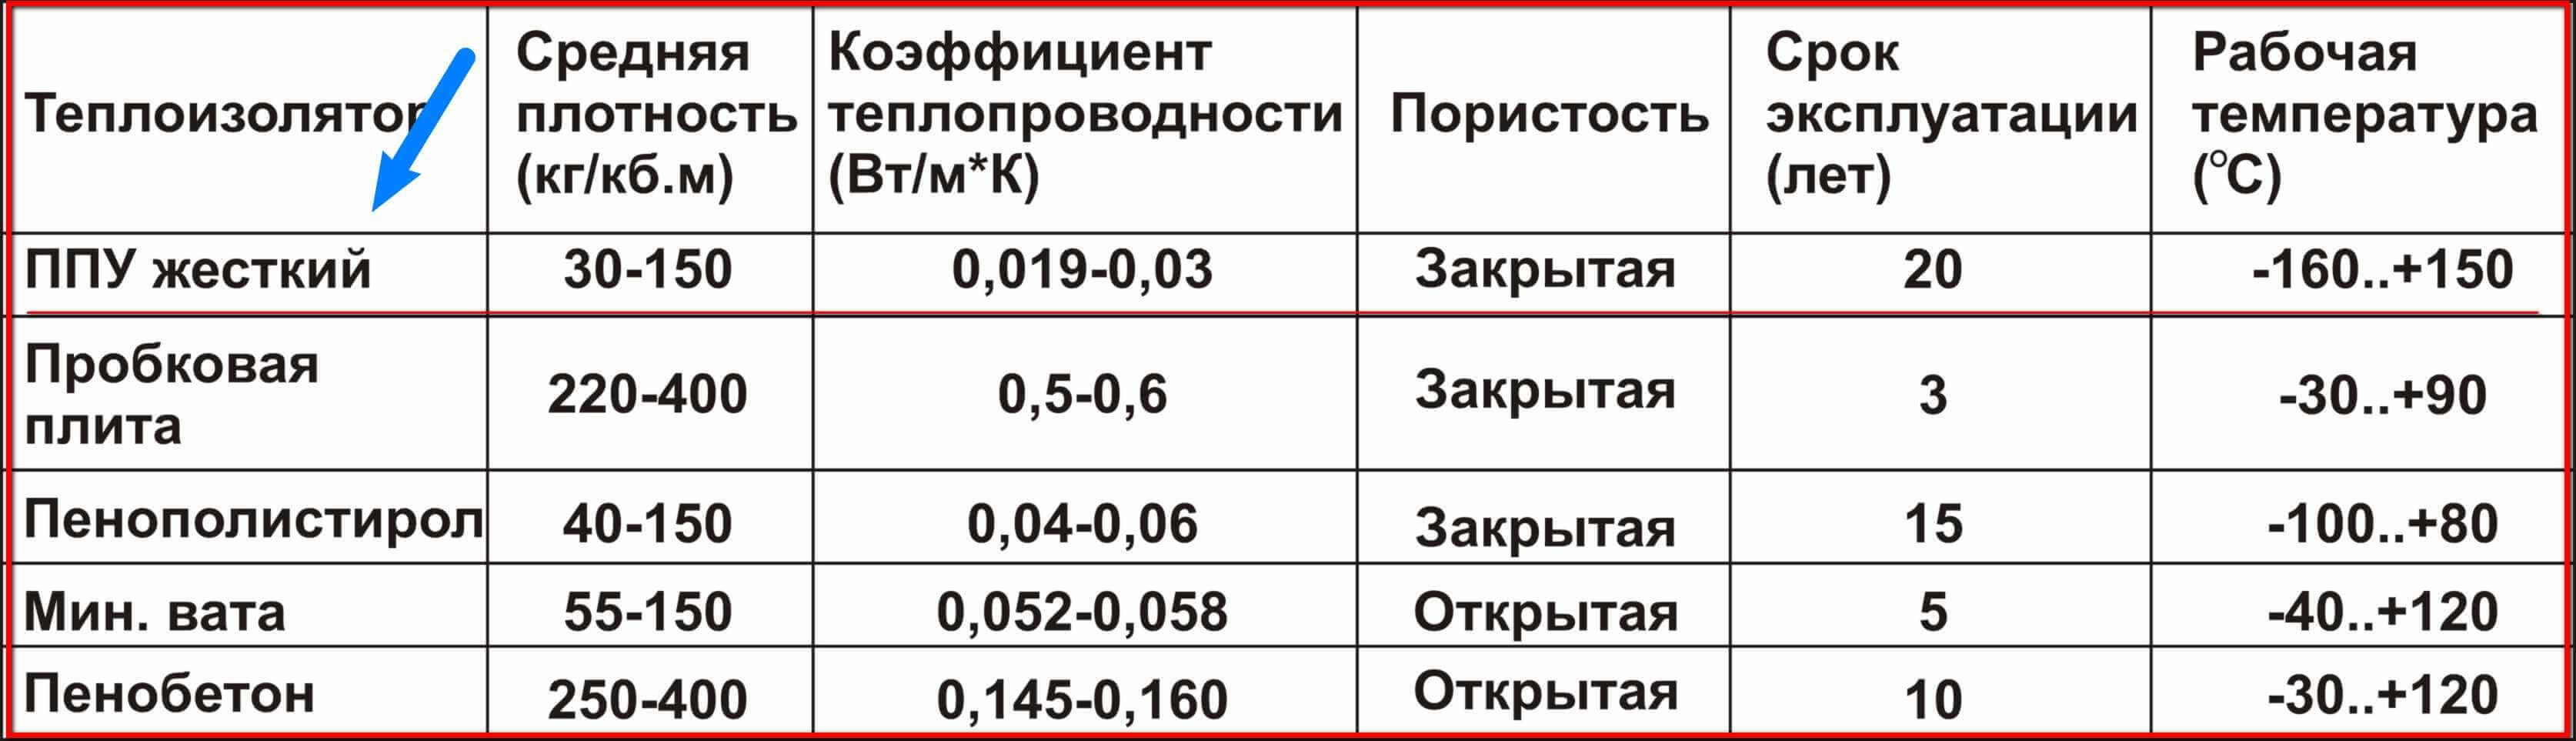 таблица характеристик ппу